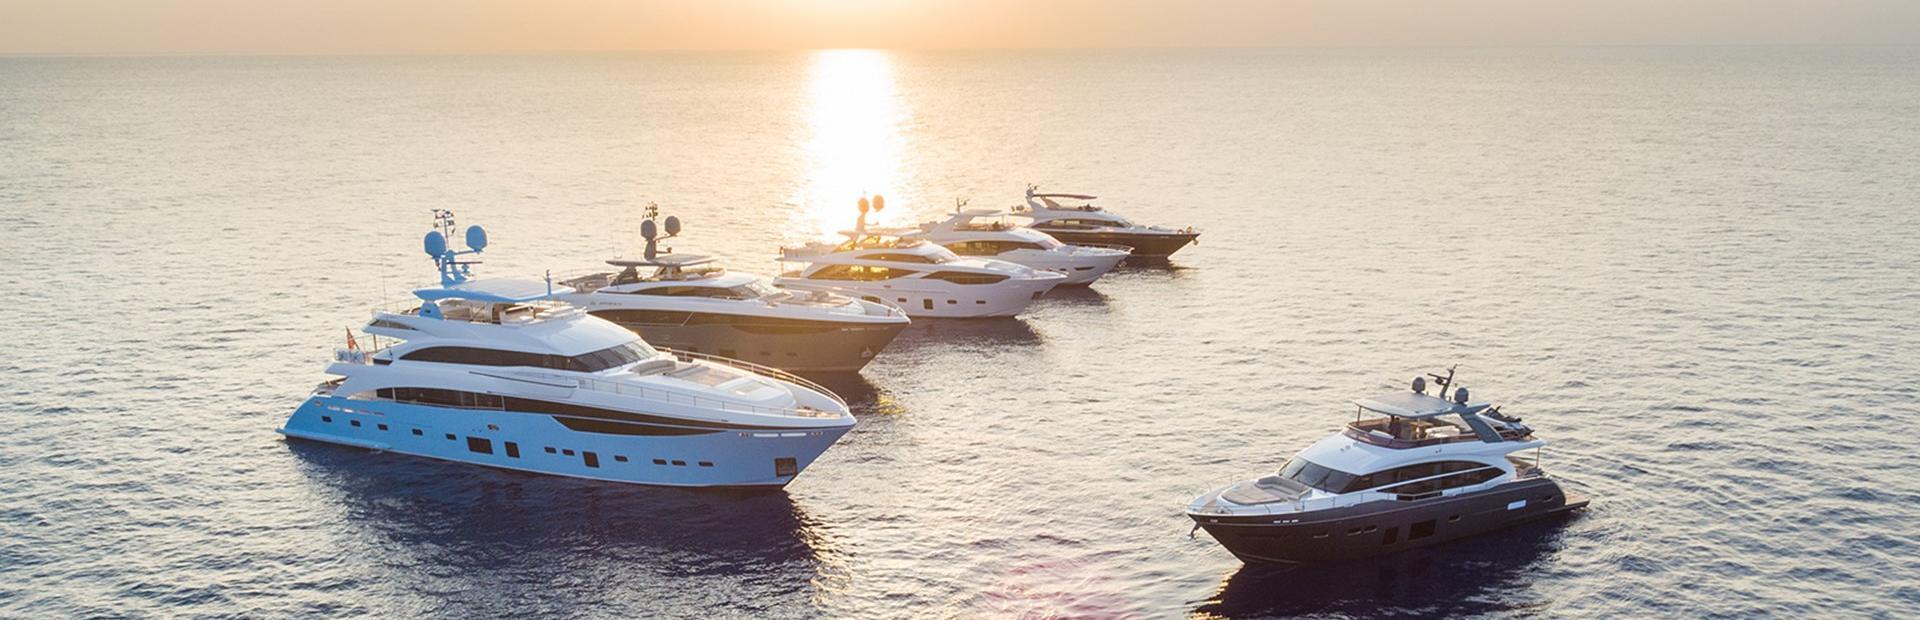 Princess Yachts  Profile Photo